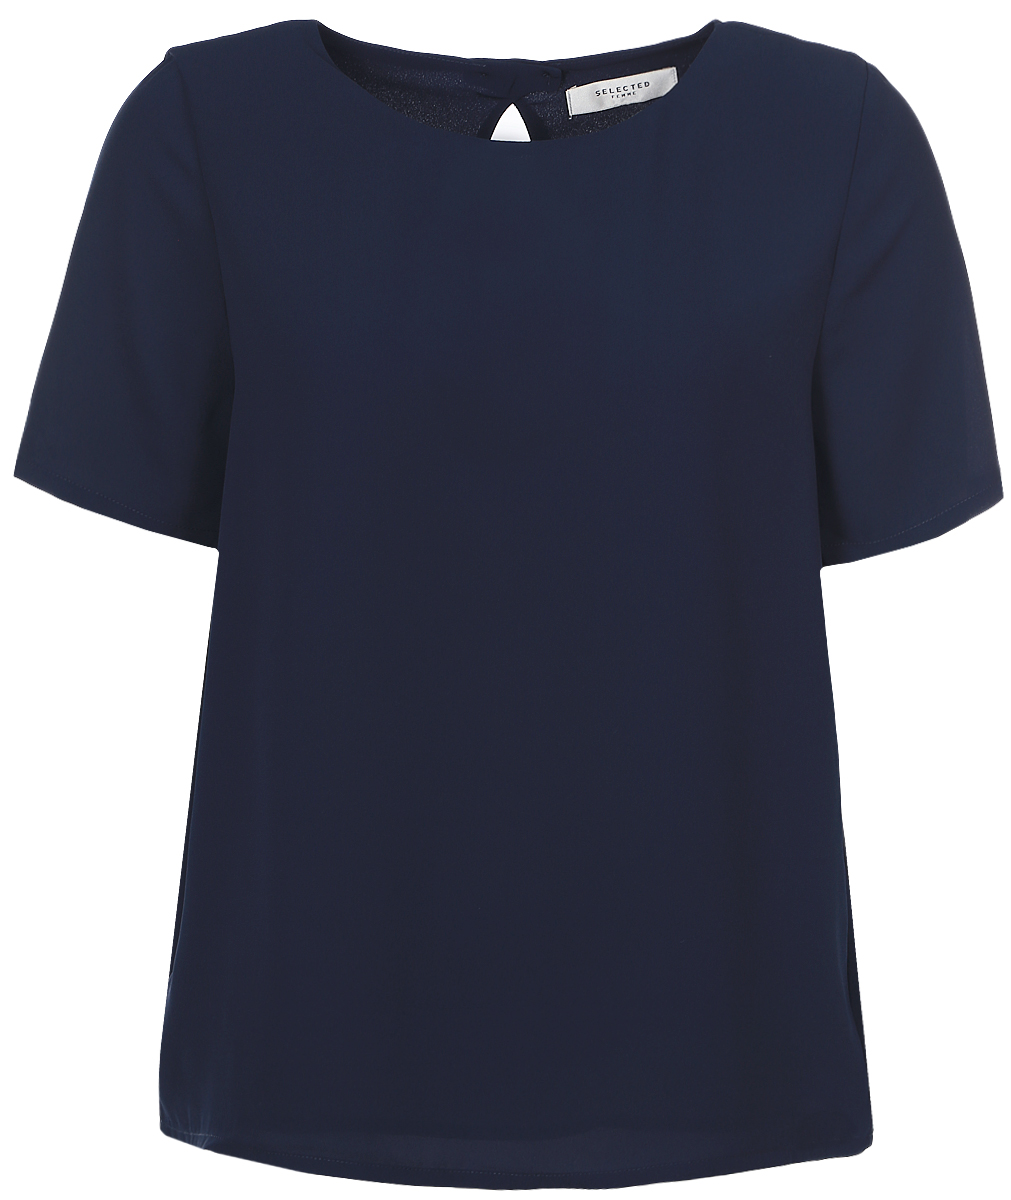 Блузка женская Selected Femme, цвет: темно-синий. 16054002. Размер 38 (44)